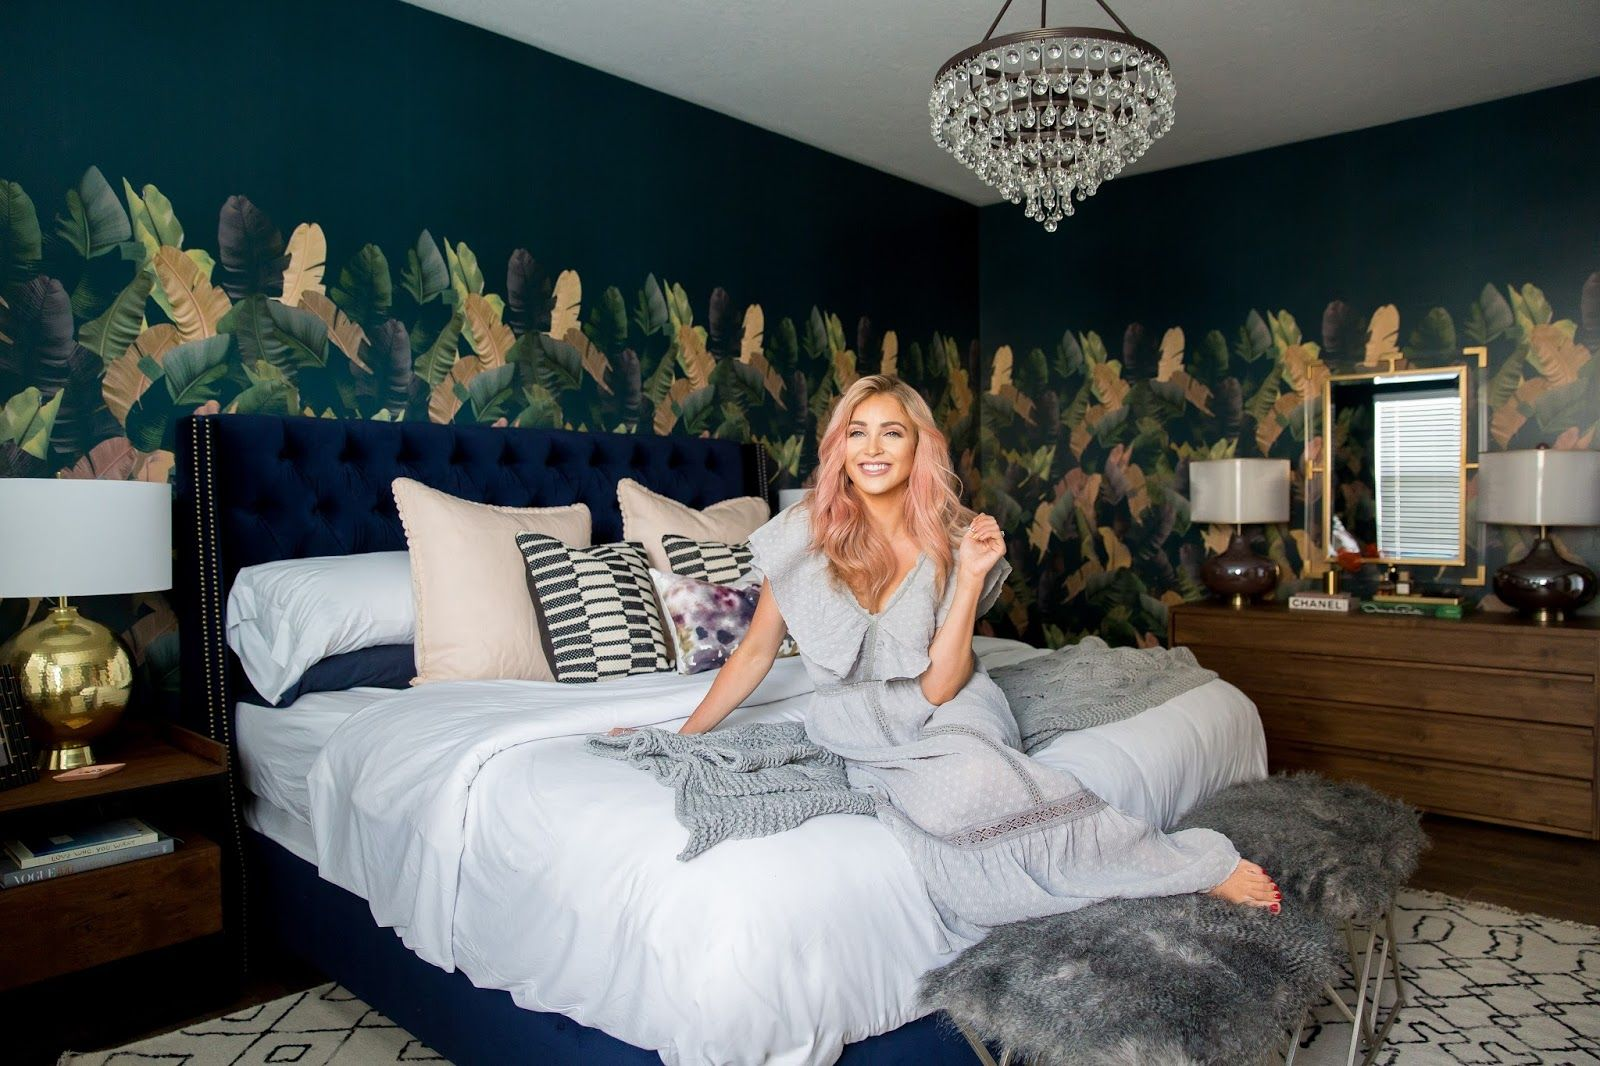 Wallpaper Design with Lulu & Cara Loren Lulu